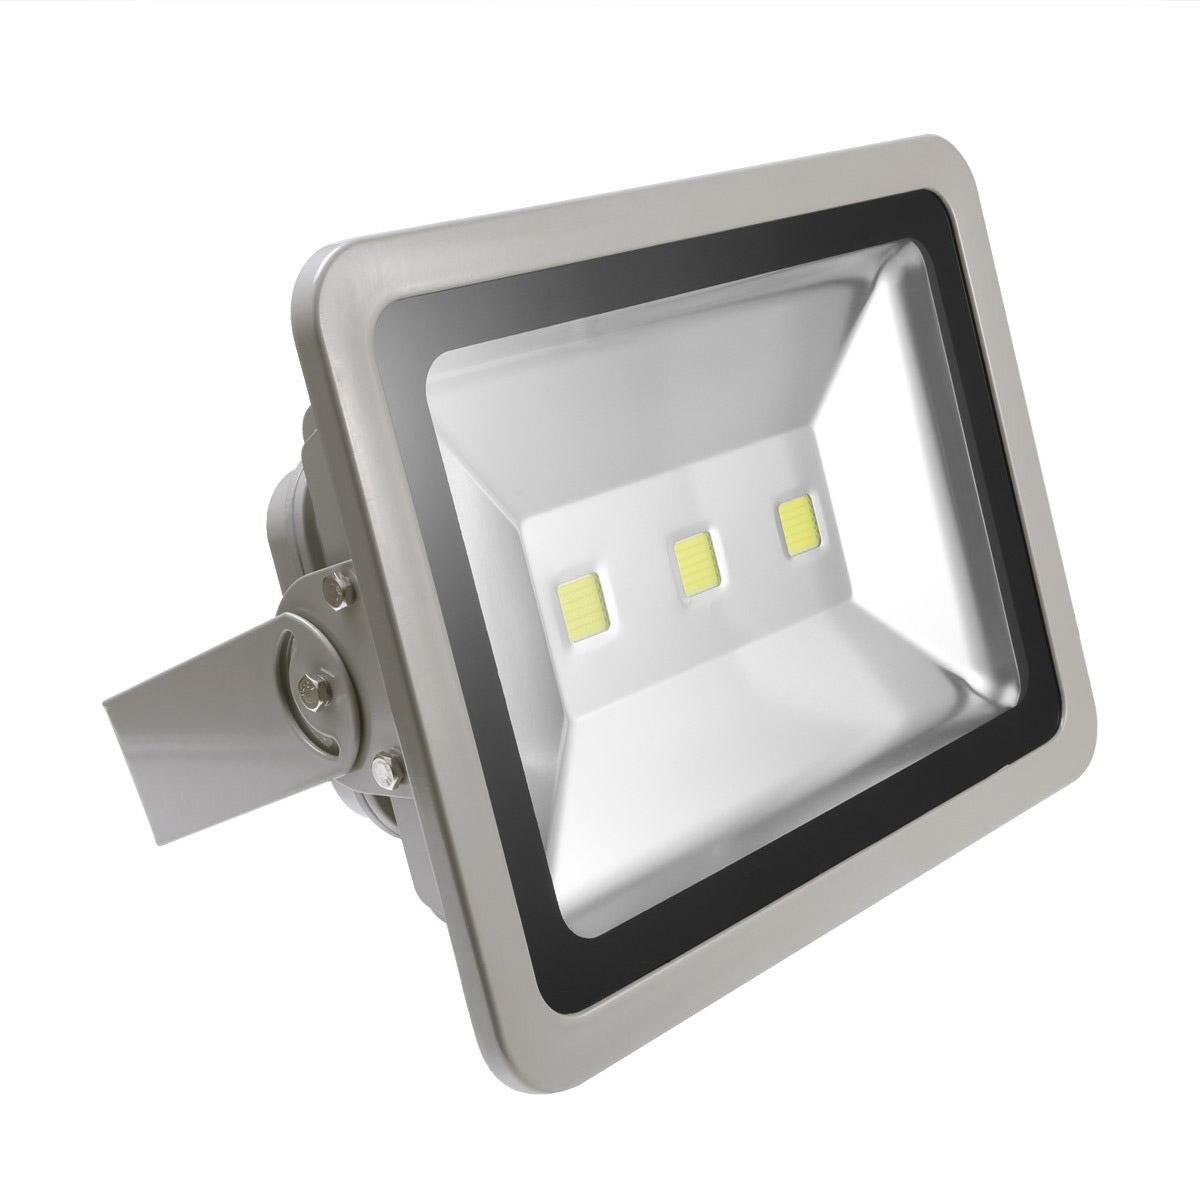 Luces led o control de iluminaci n cual es la mejor for Luces led para jardineras